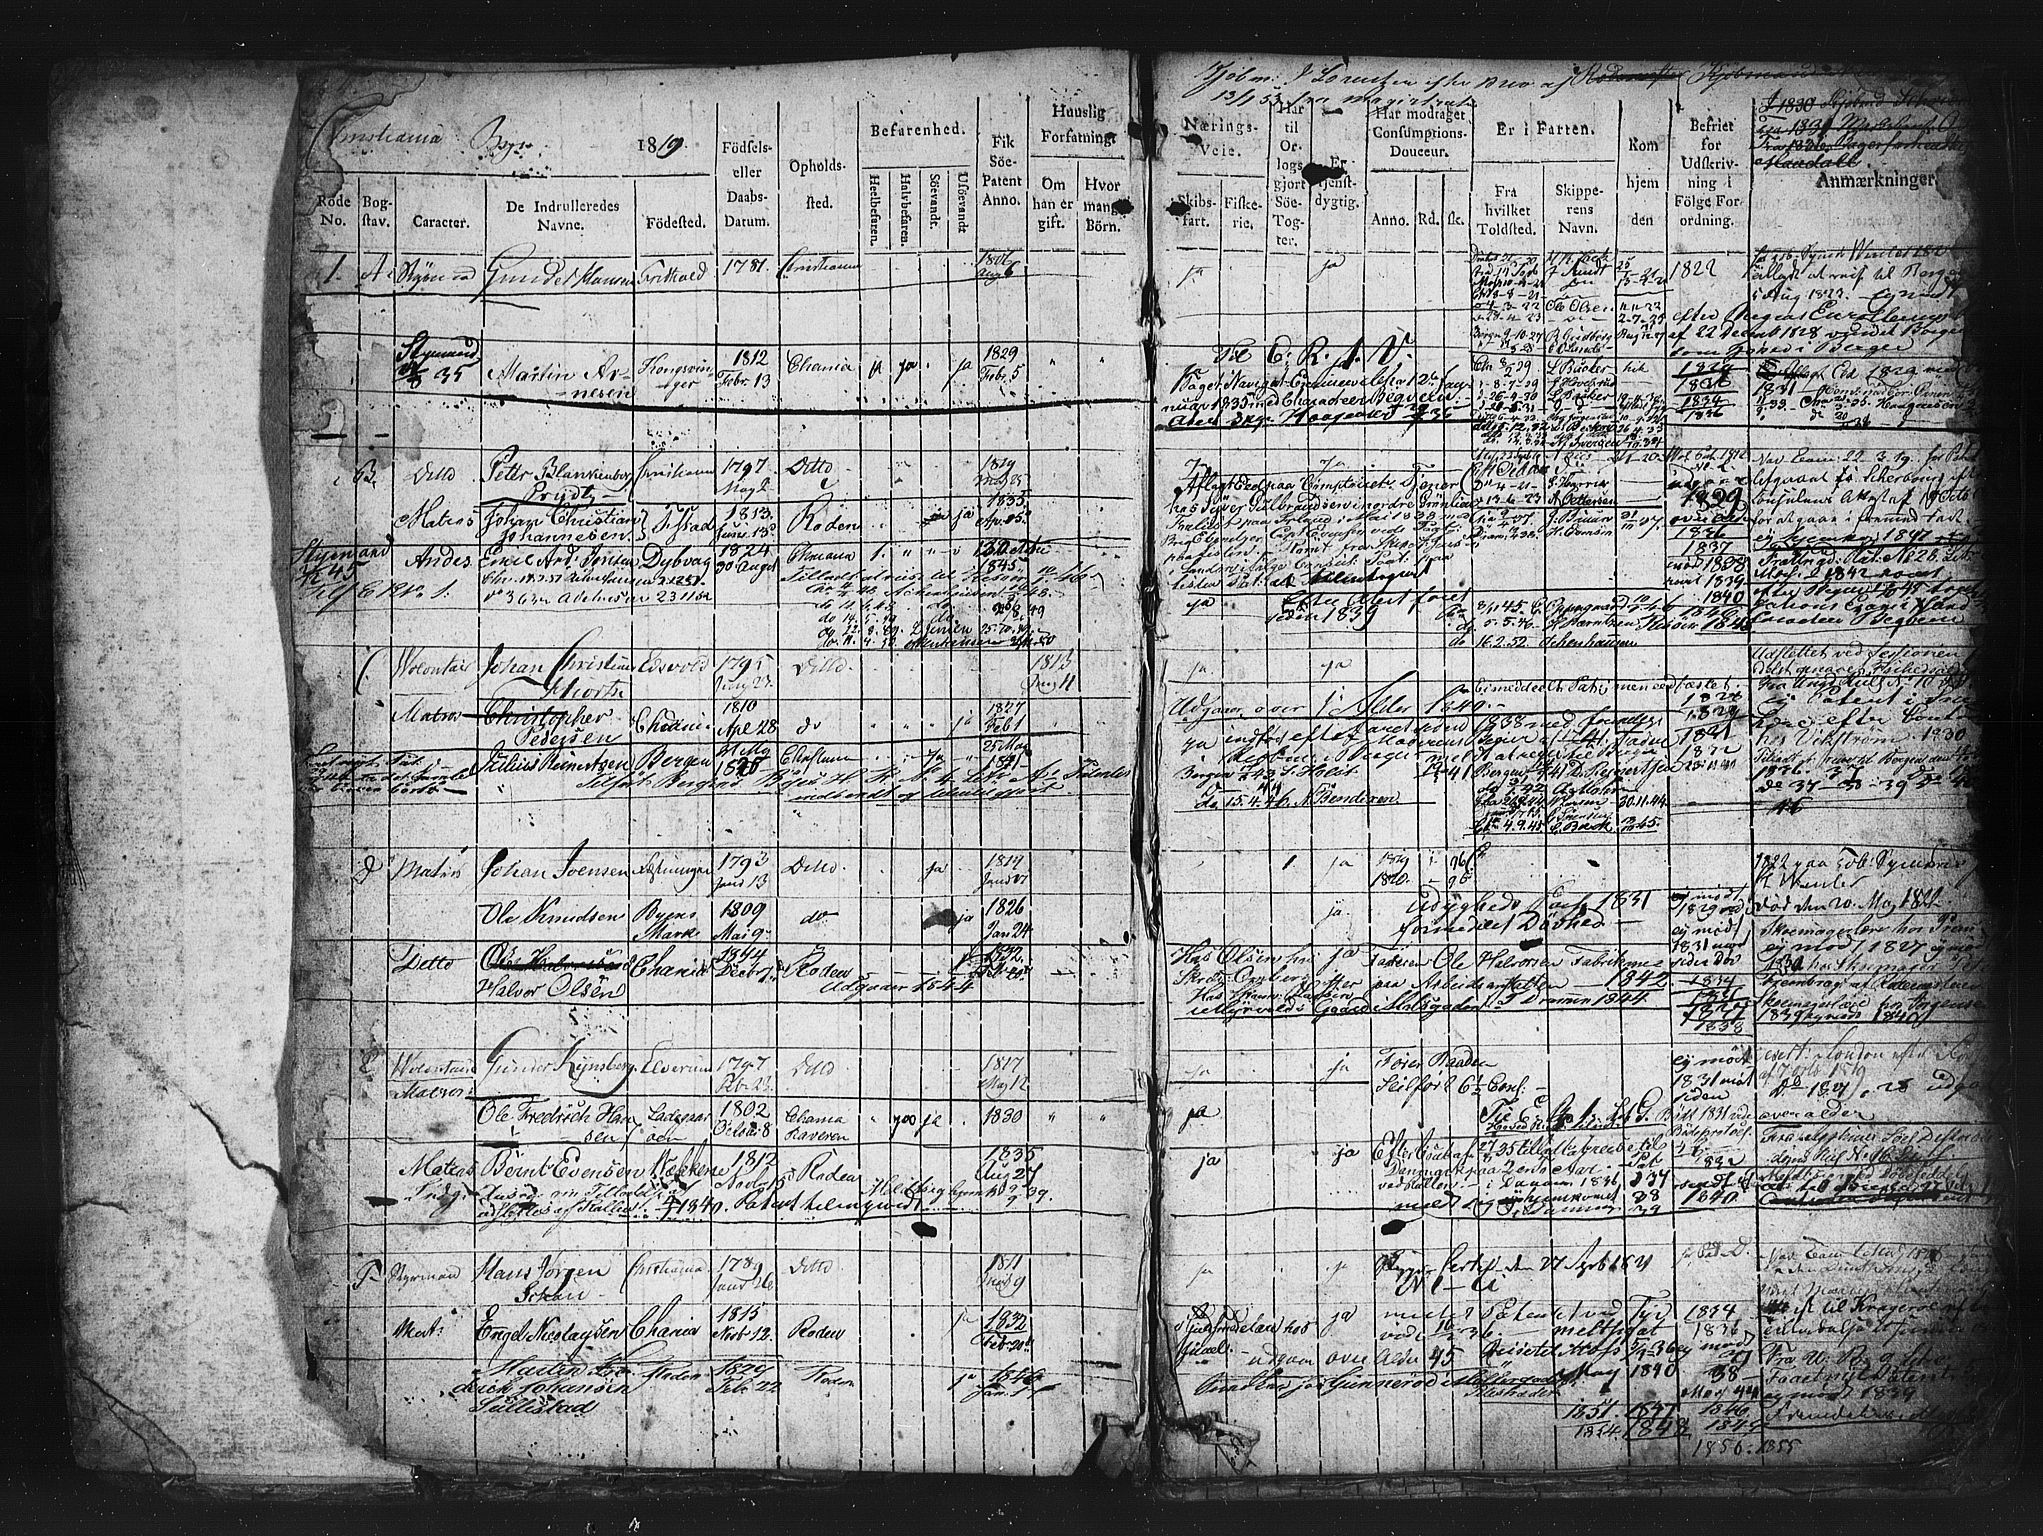 SAO, Oslo mønstringskontor, F/Fc/Fcb/L0001: Hovedrulle, 1819, s. 1